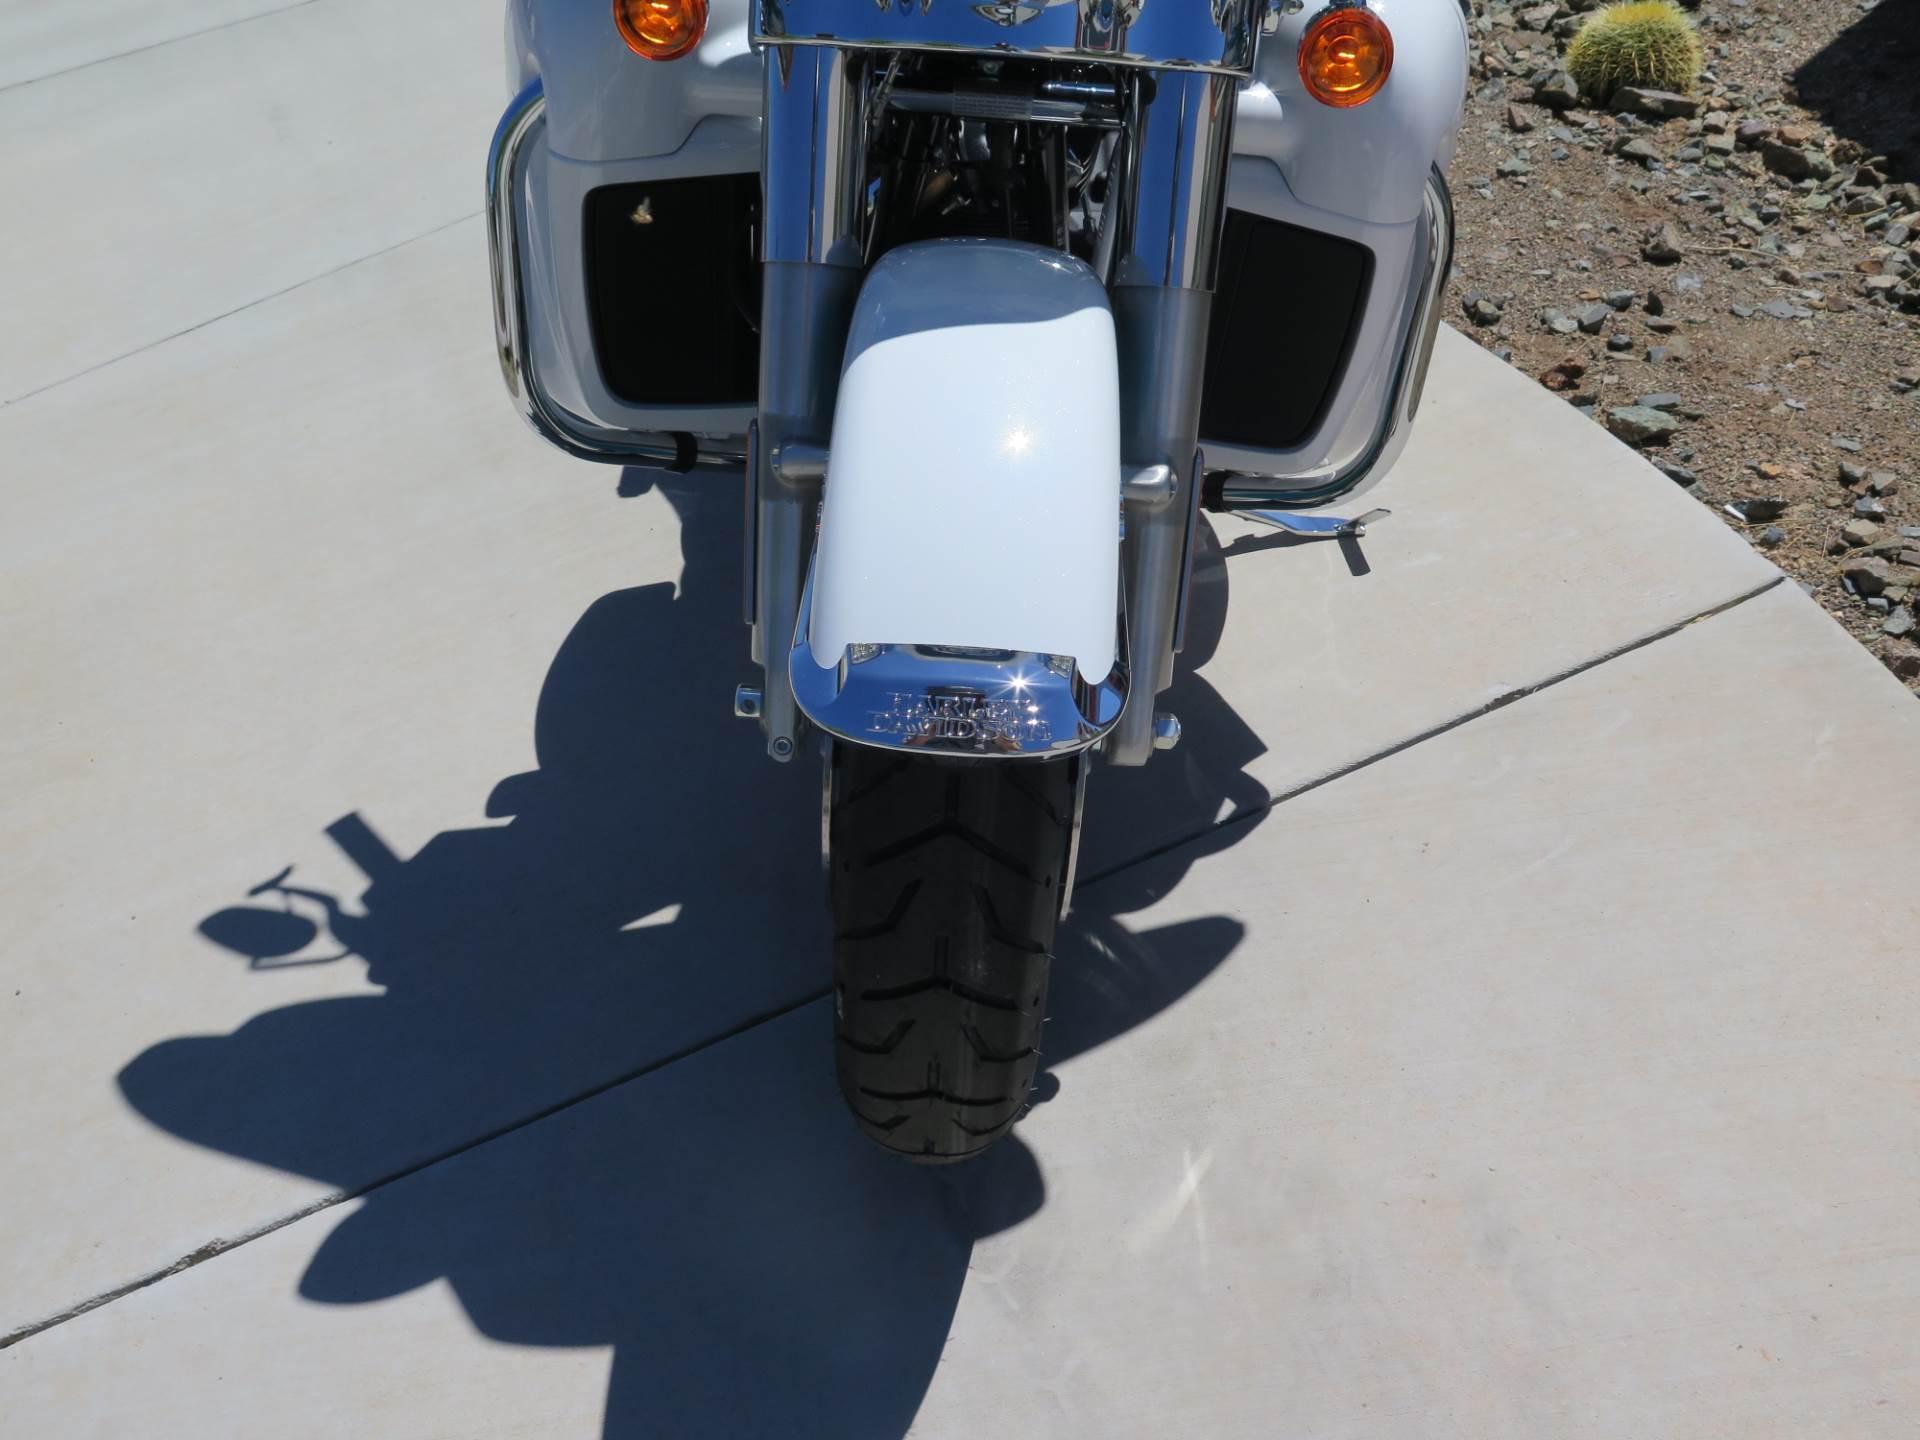 2017 Harley-Davidson Electra Glide® Ultra Classic® in Scottsdale, Arizona